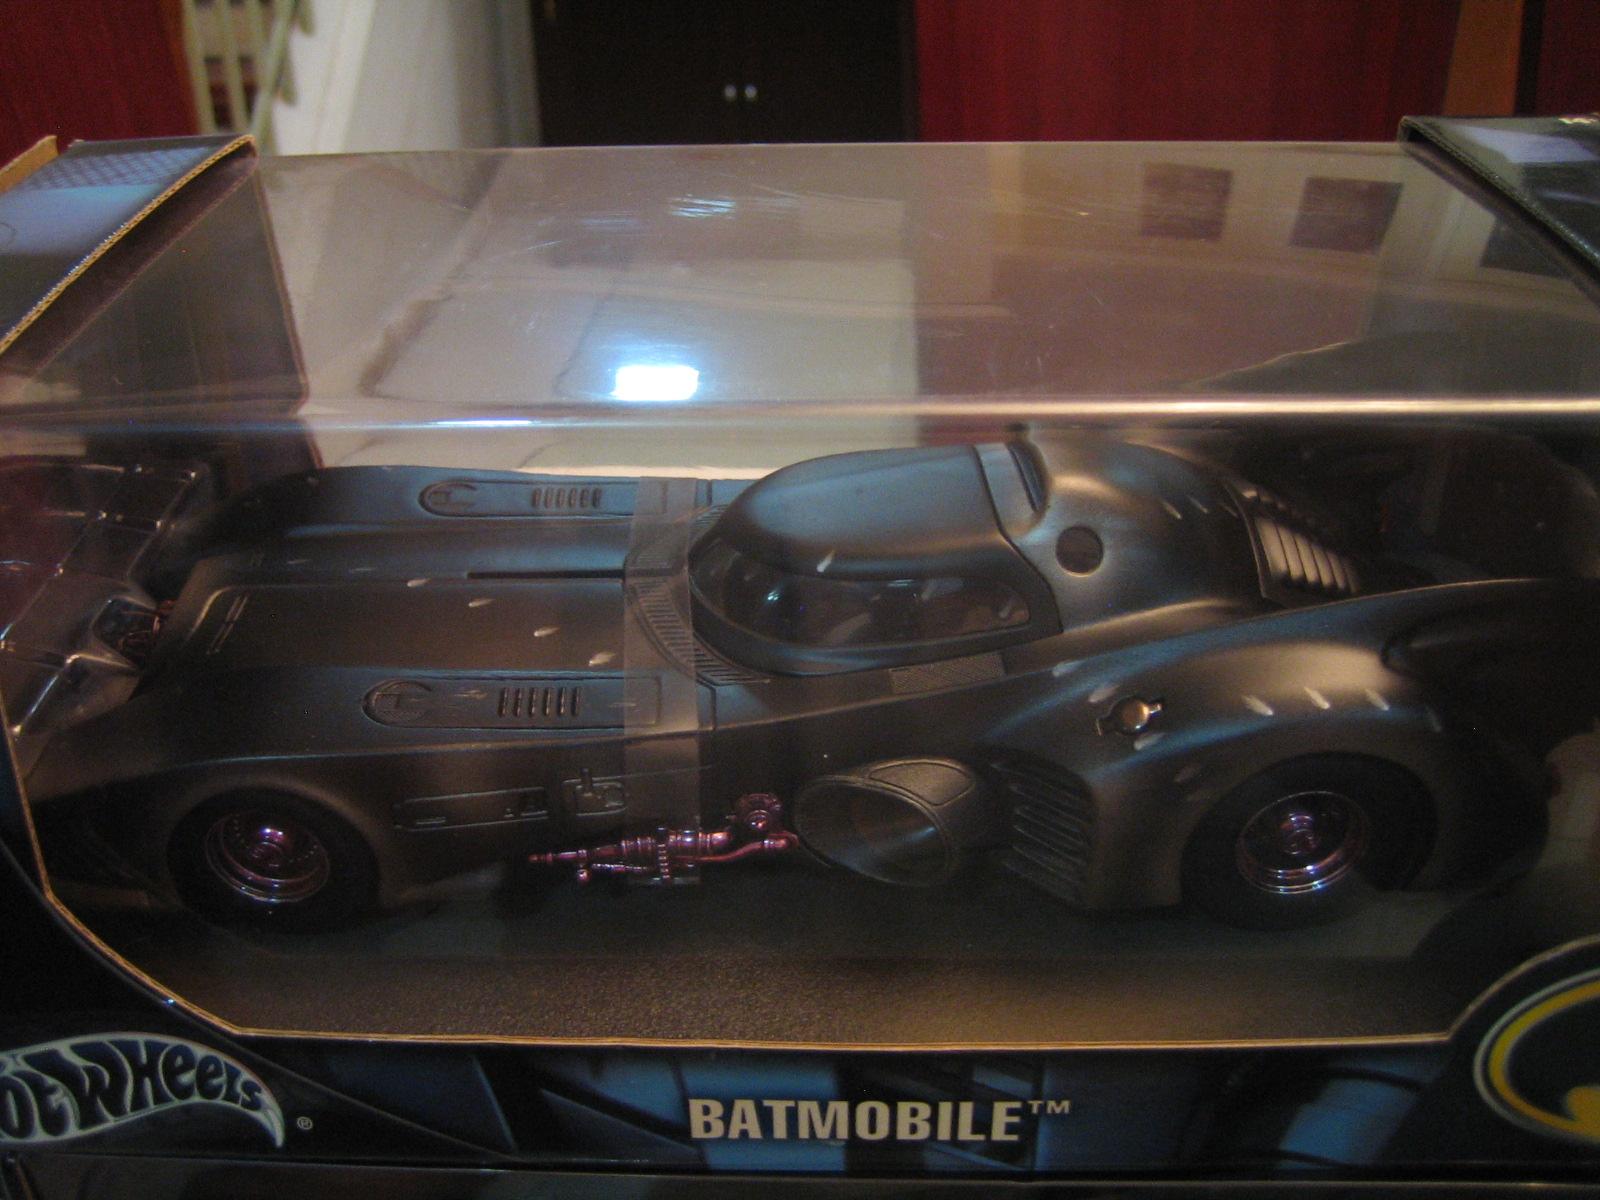 [Games] Batman Arkham Knight - DLC Batman 1989 (Preview) Batmobiles+from+Batman+movie+024